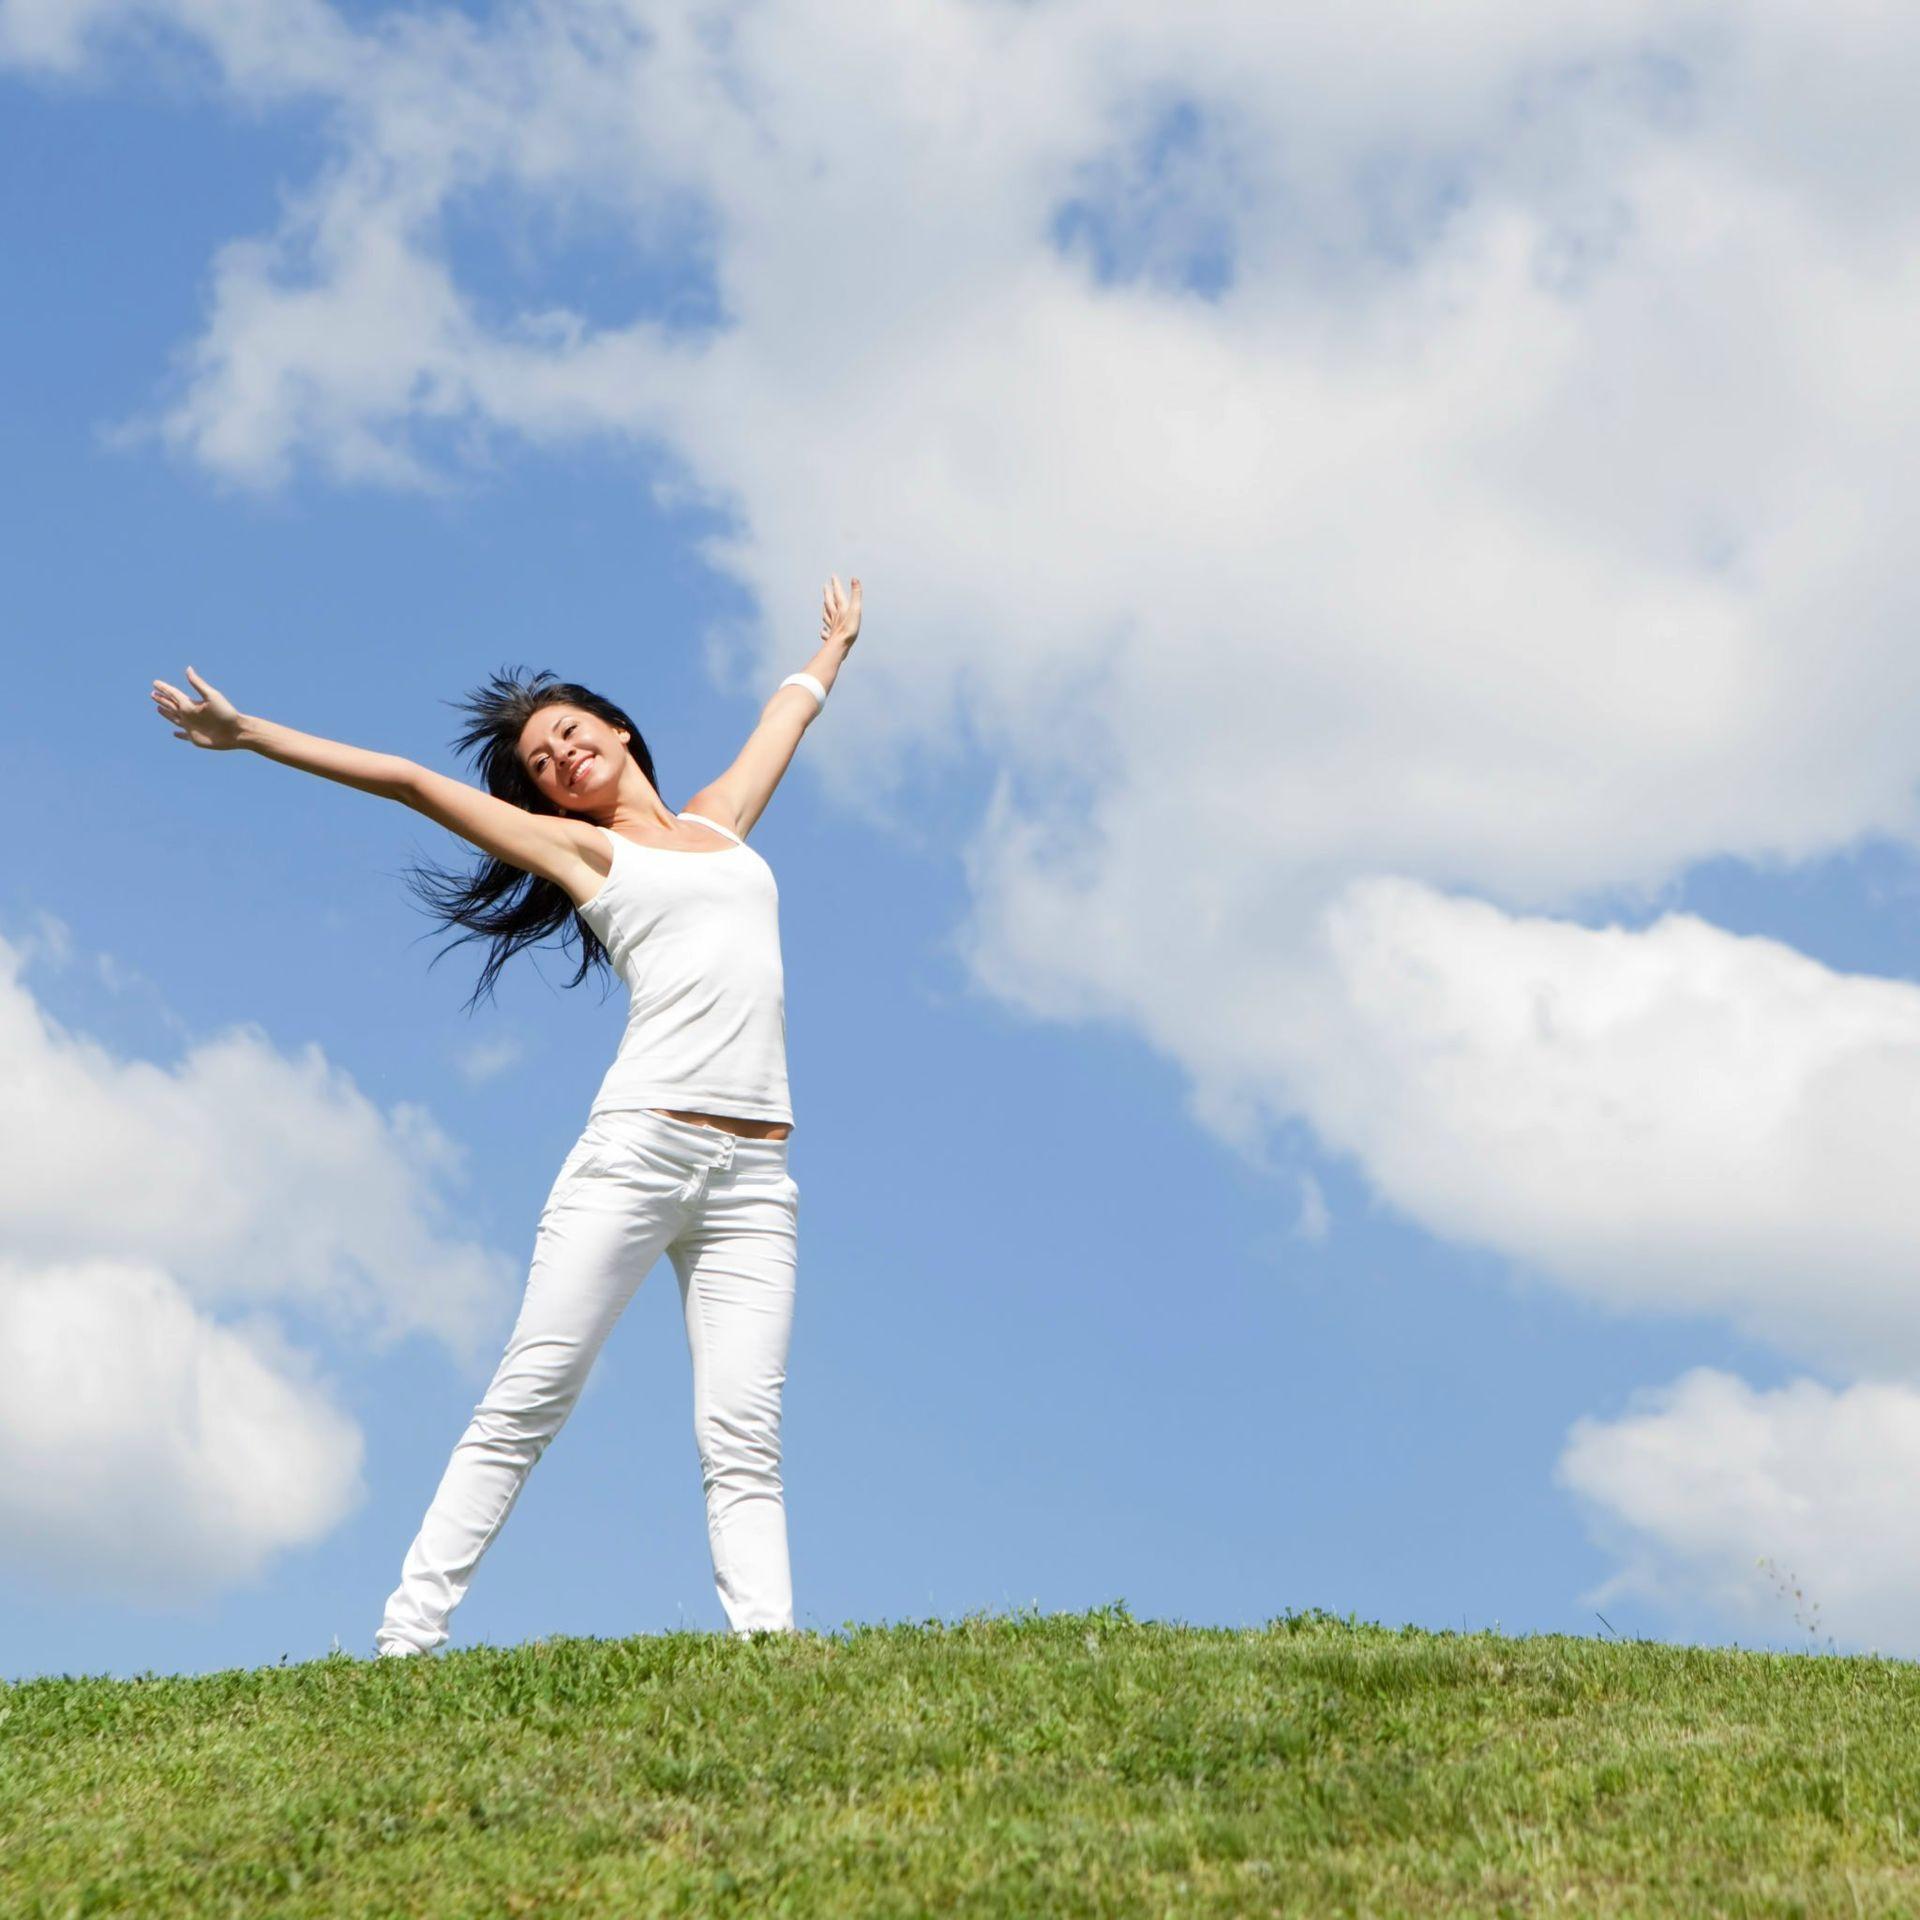 aloe-vera-healthier-lifestyle-health